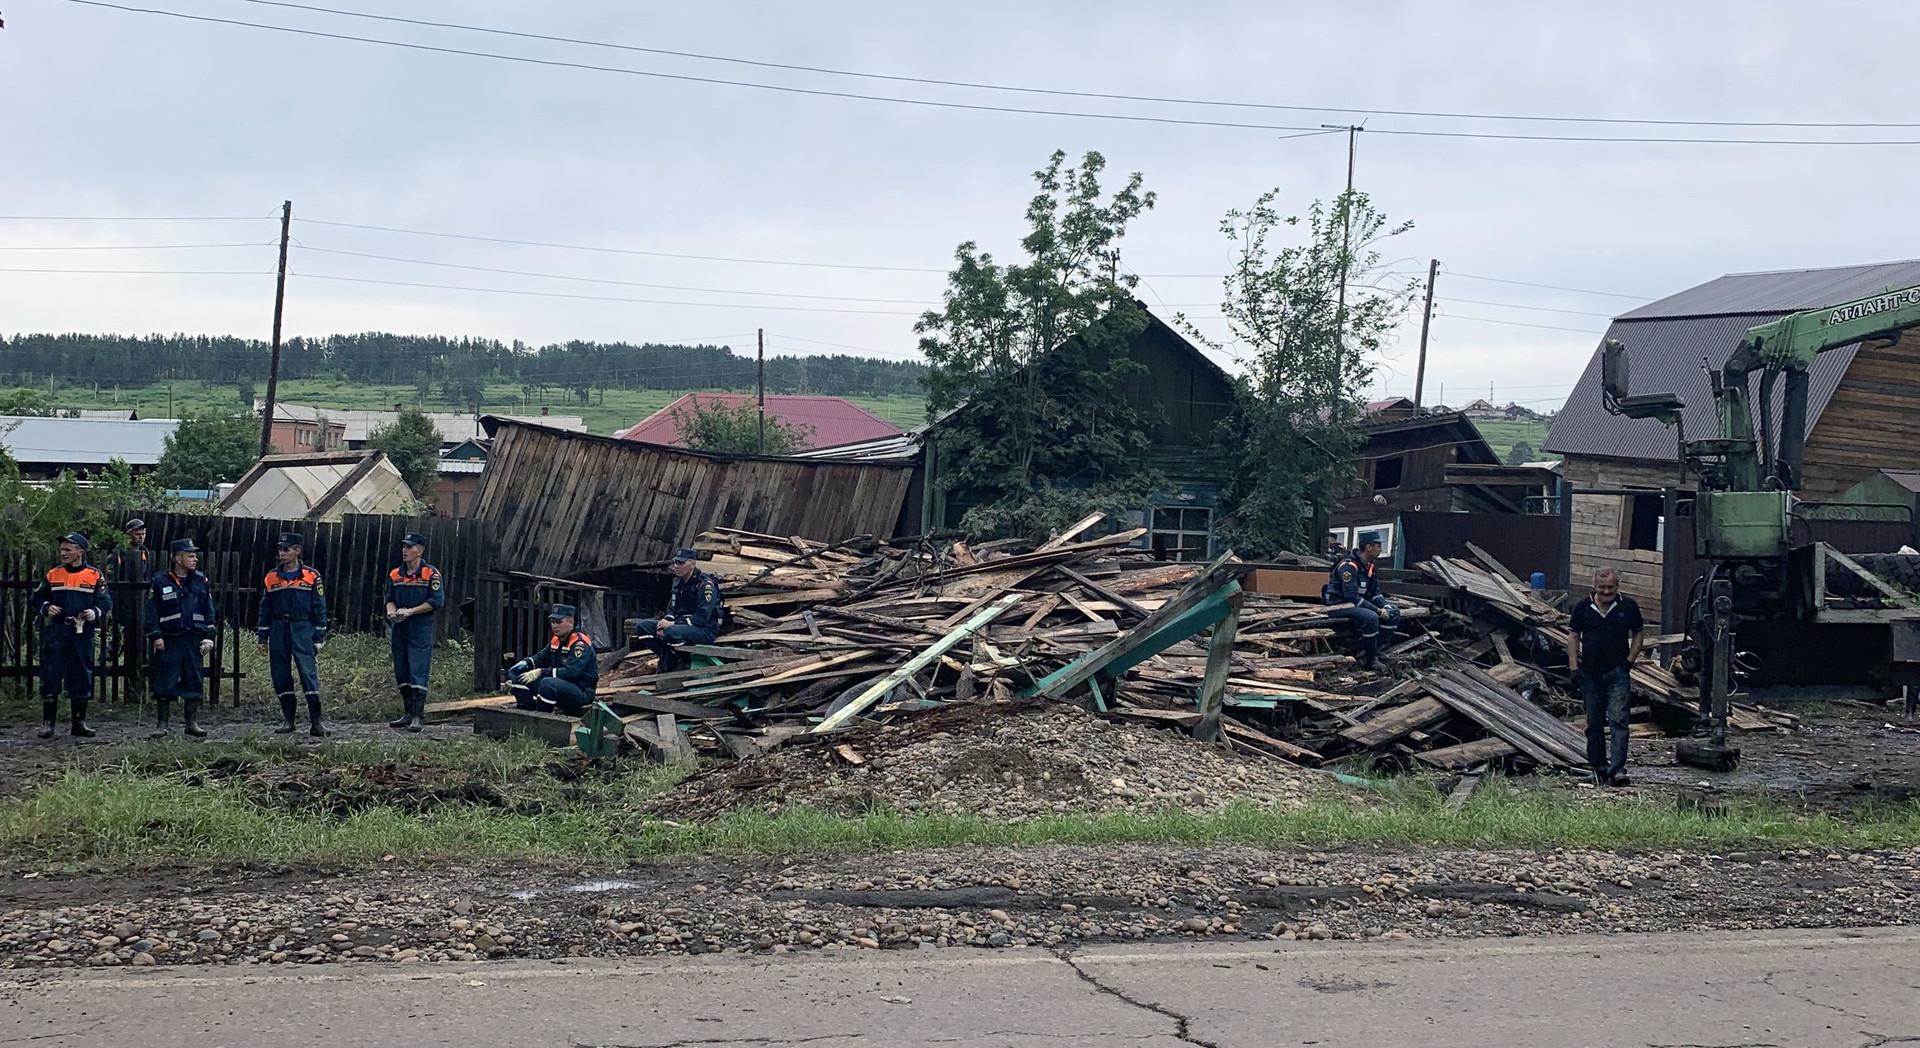 Сотрудники МЧС разбирают разрушенные дома в Тулуне